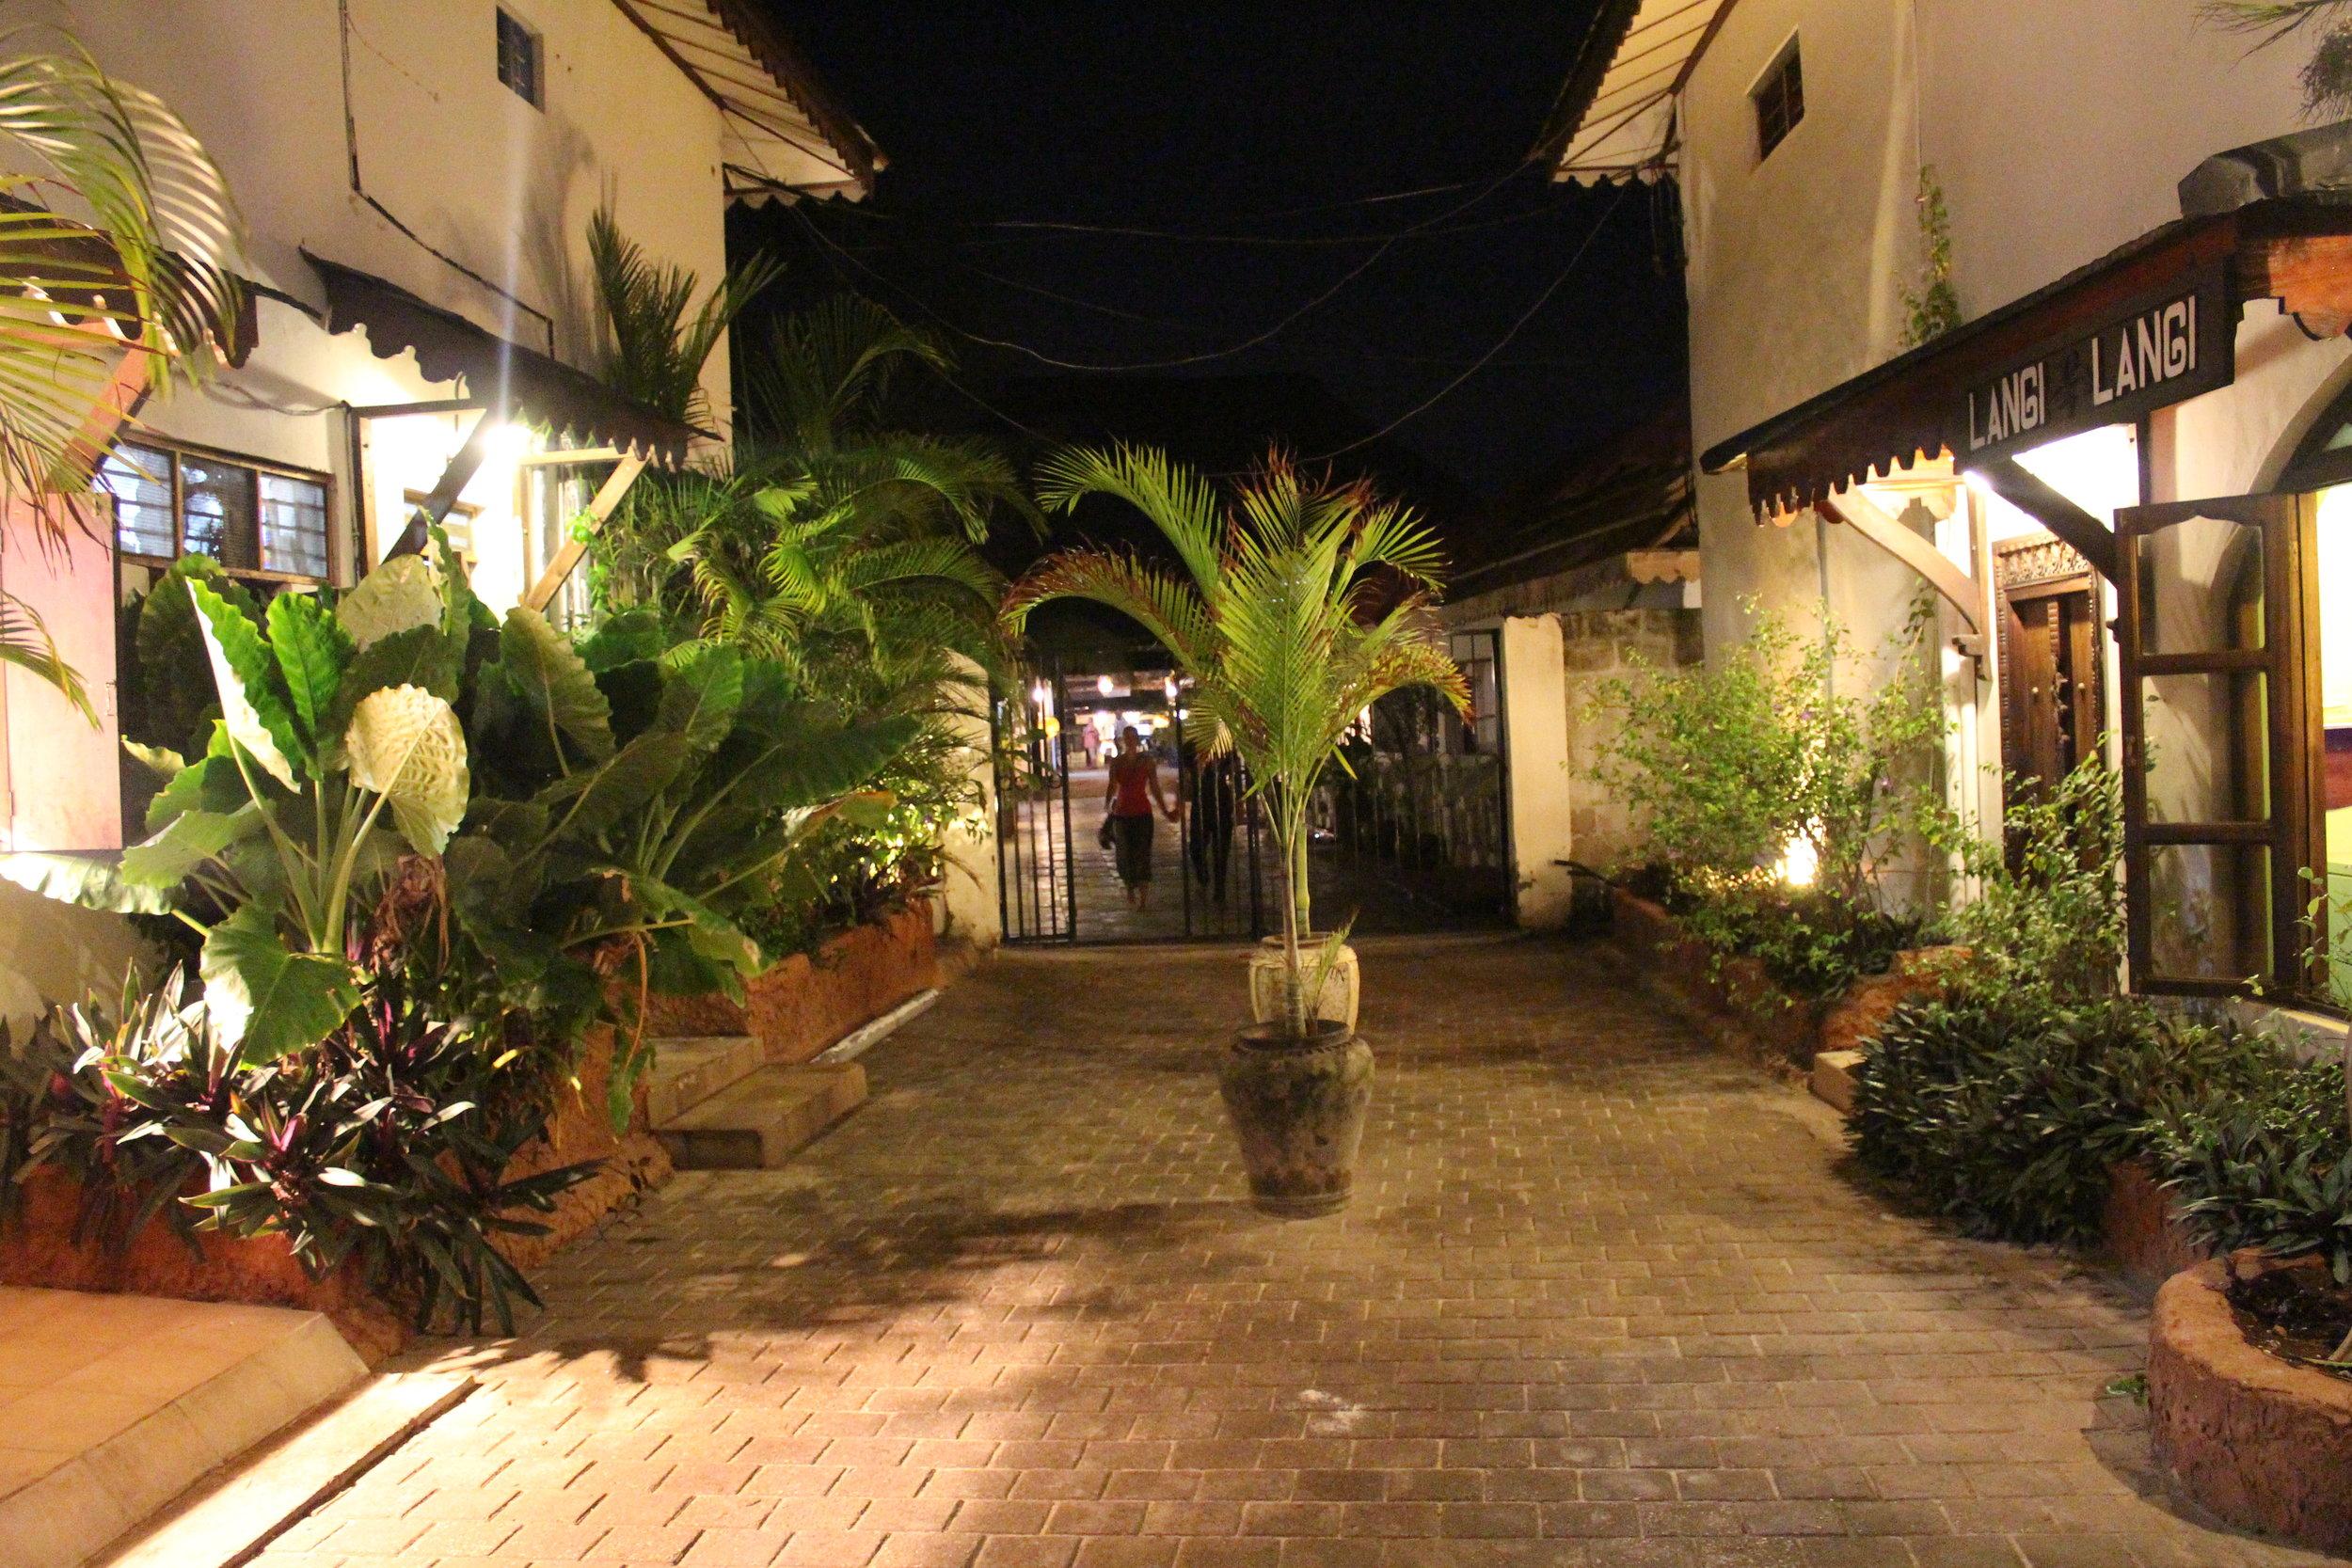 Nungwi, Zanzibar at night